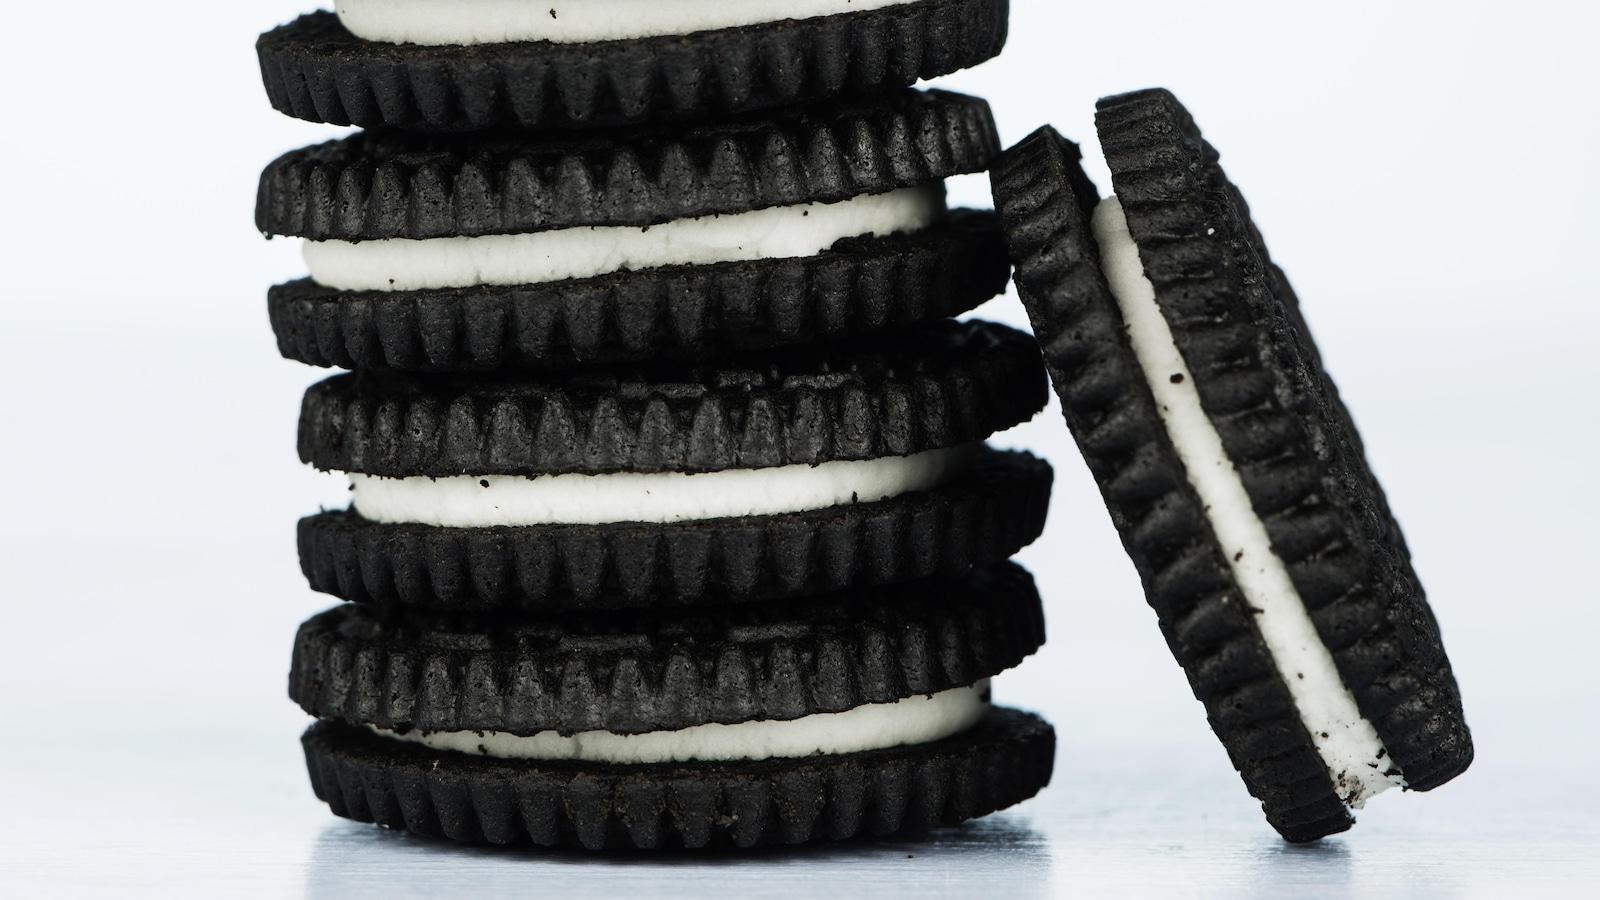 Des biscuits de marque Oreo